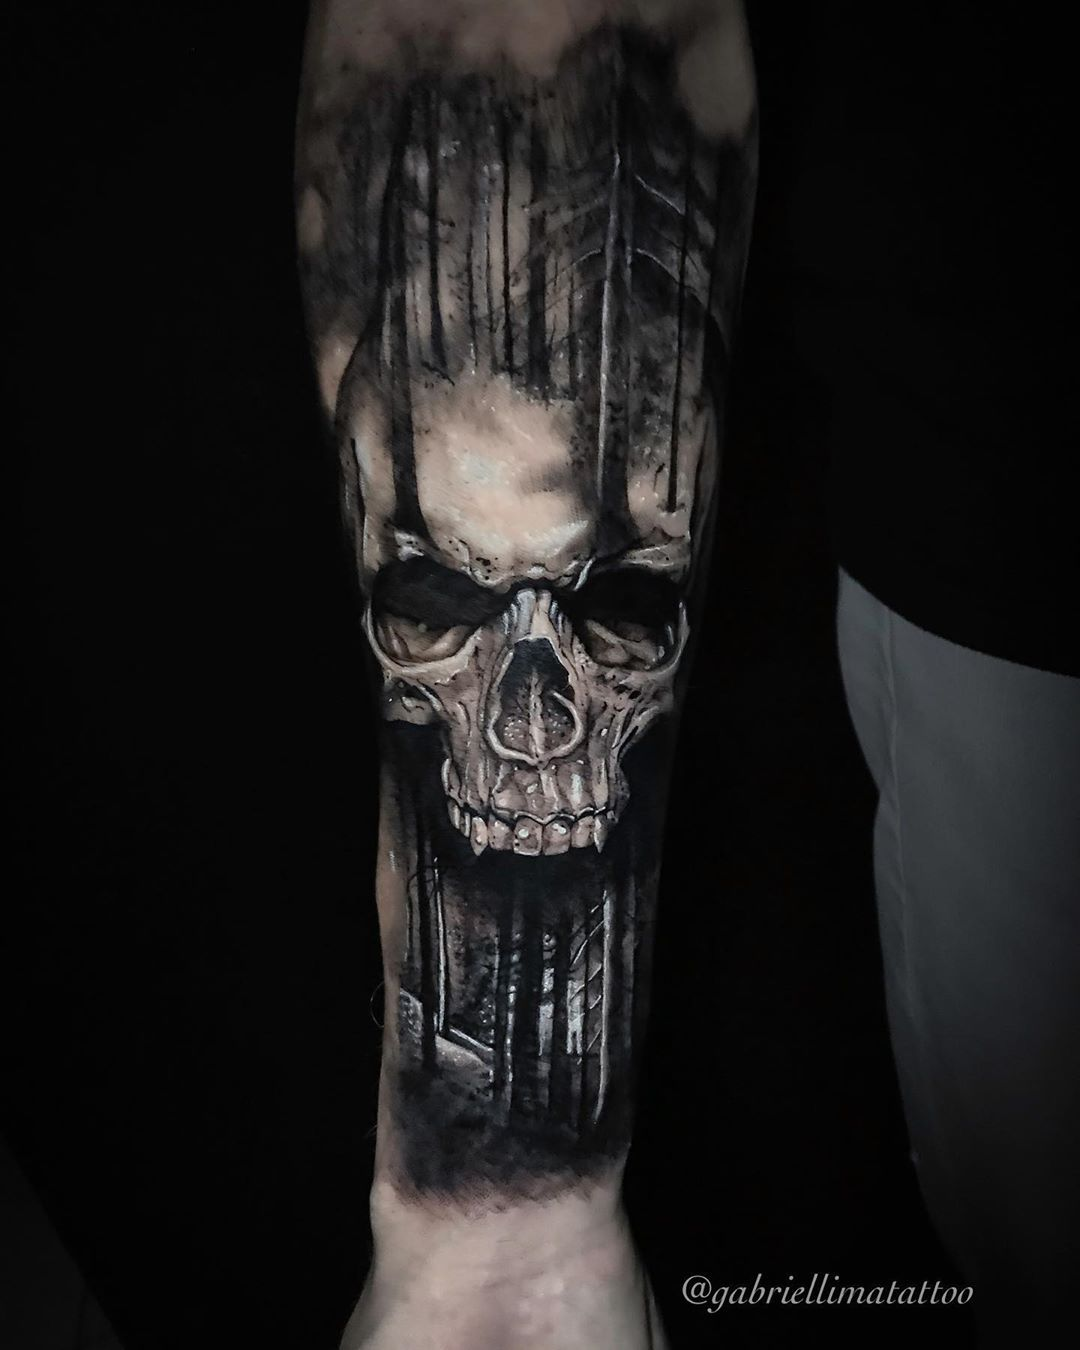 Obrigado a todos que confiam em meu trabalho. ☎️ Orçamentos e agendamentos através do WhatsApp (11)93094-2455.  #art #bishop #bishopbrasil #blackandwhite #blackandwhitetattoo #cheyenne #equilattera #gabriellimatattoo #inkgroundtattoo #inspiration #inked #inpiredtattoos #kwadron #loucostattoos #mogidascruzes #realism #tattoo #tattoos #tattooartist #tattoodo #tattoo2me #tattoo2us #tattoorealism #tattooinspiration